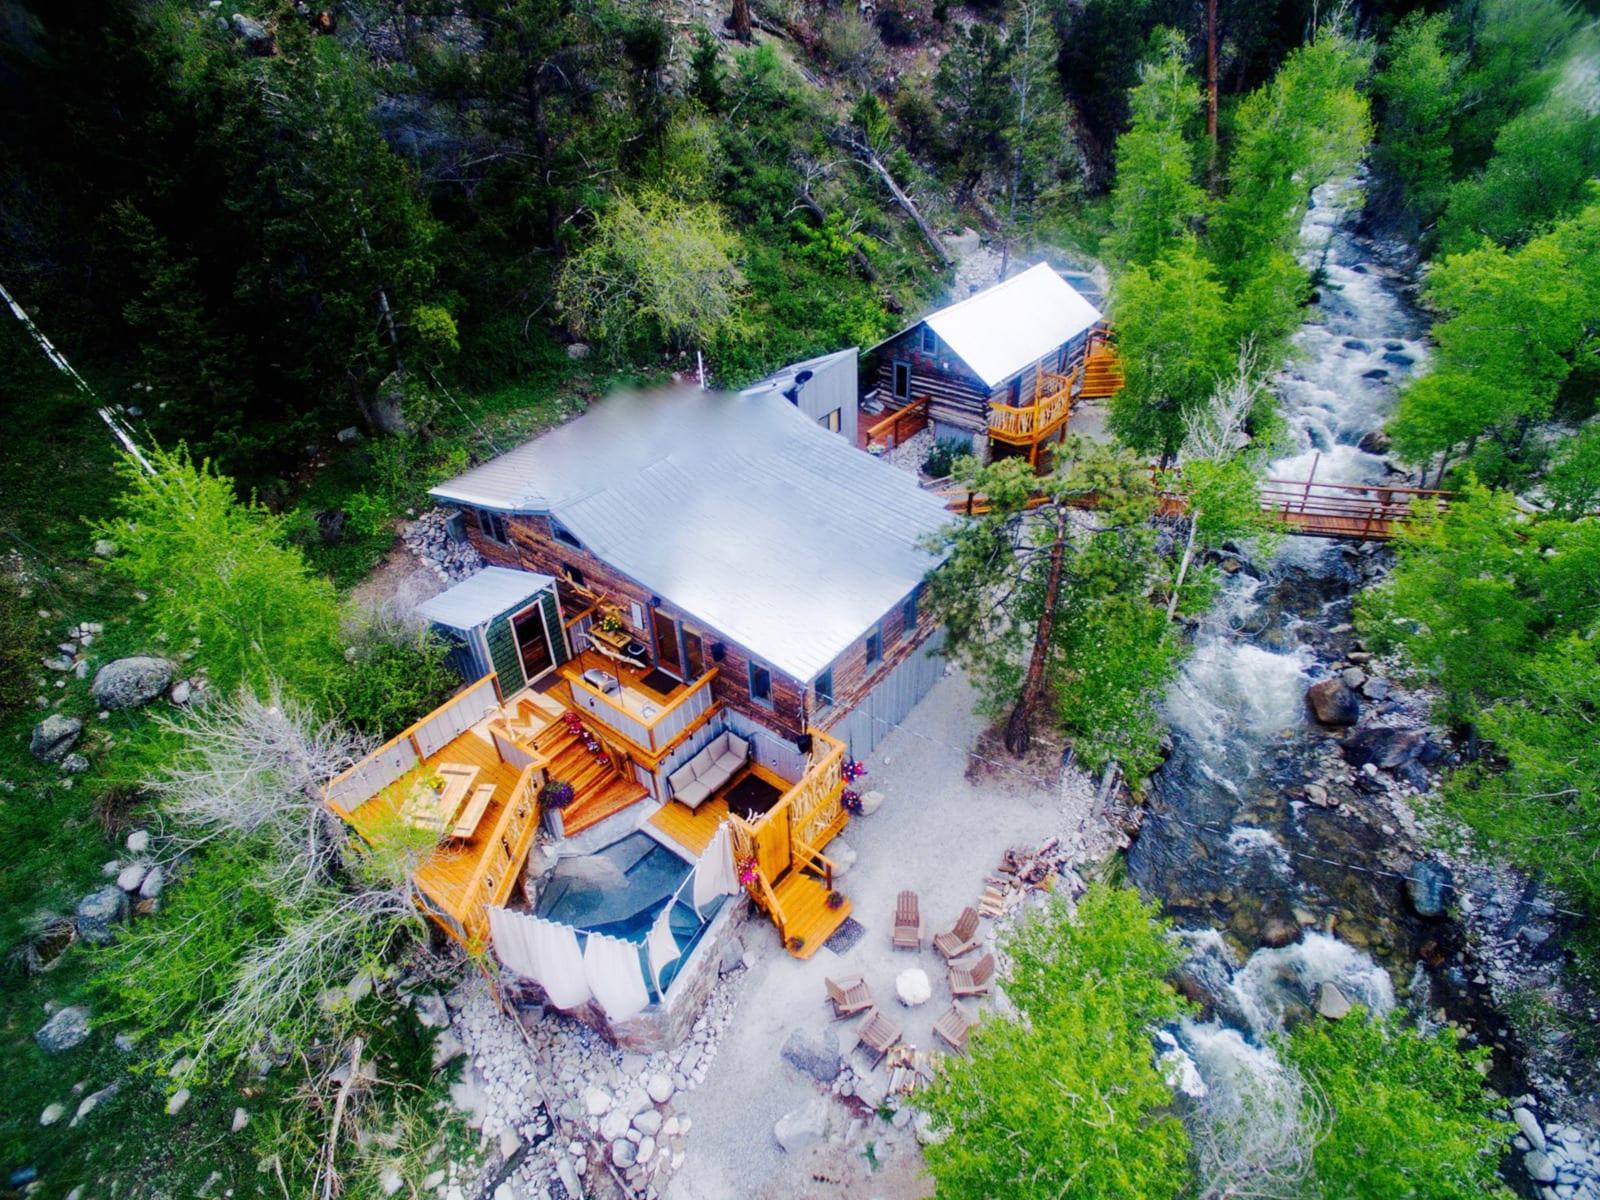 Merrifield Homestead Cabins and Hot Springs Buena Vista CO Aerial